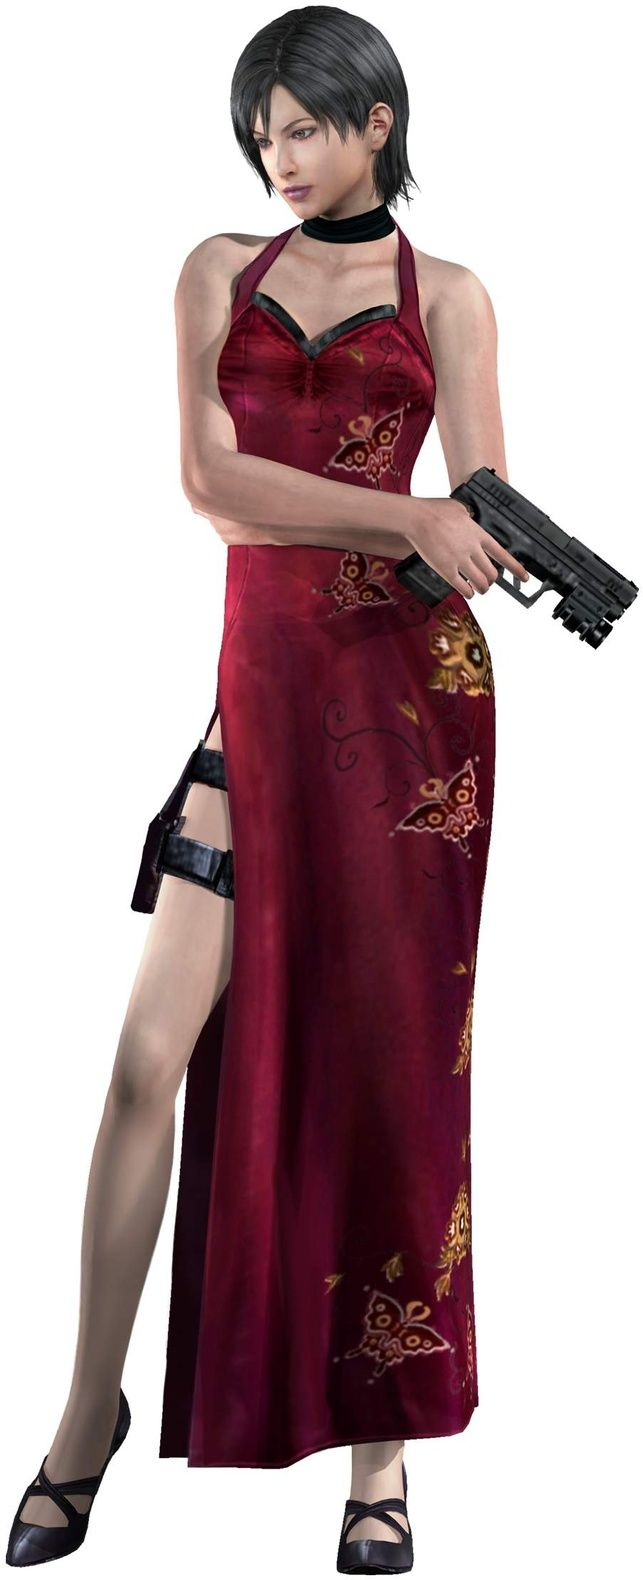 Al otro lado...Ada Wong (Resident Evil 4)